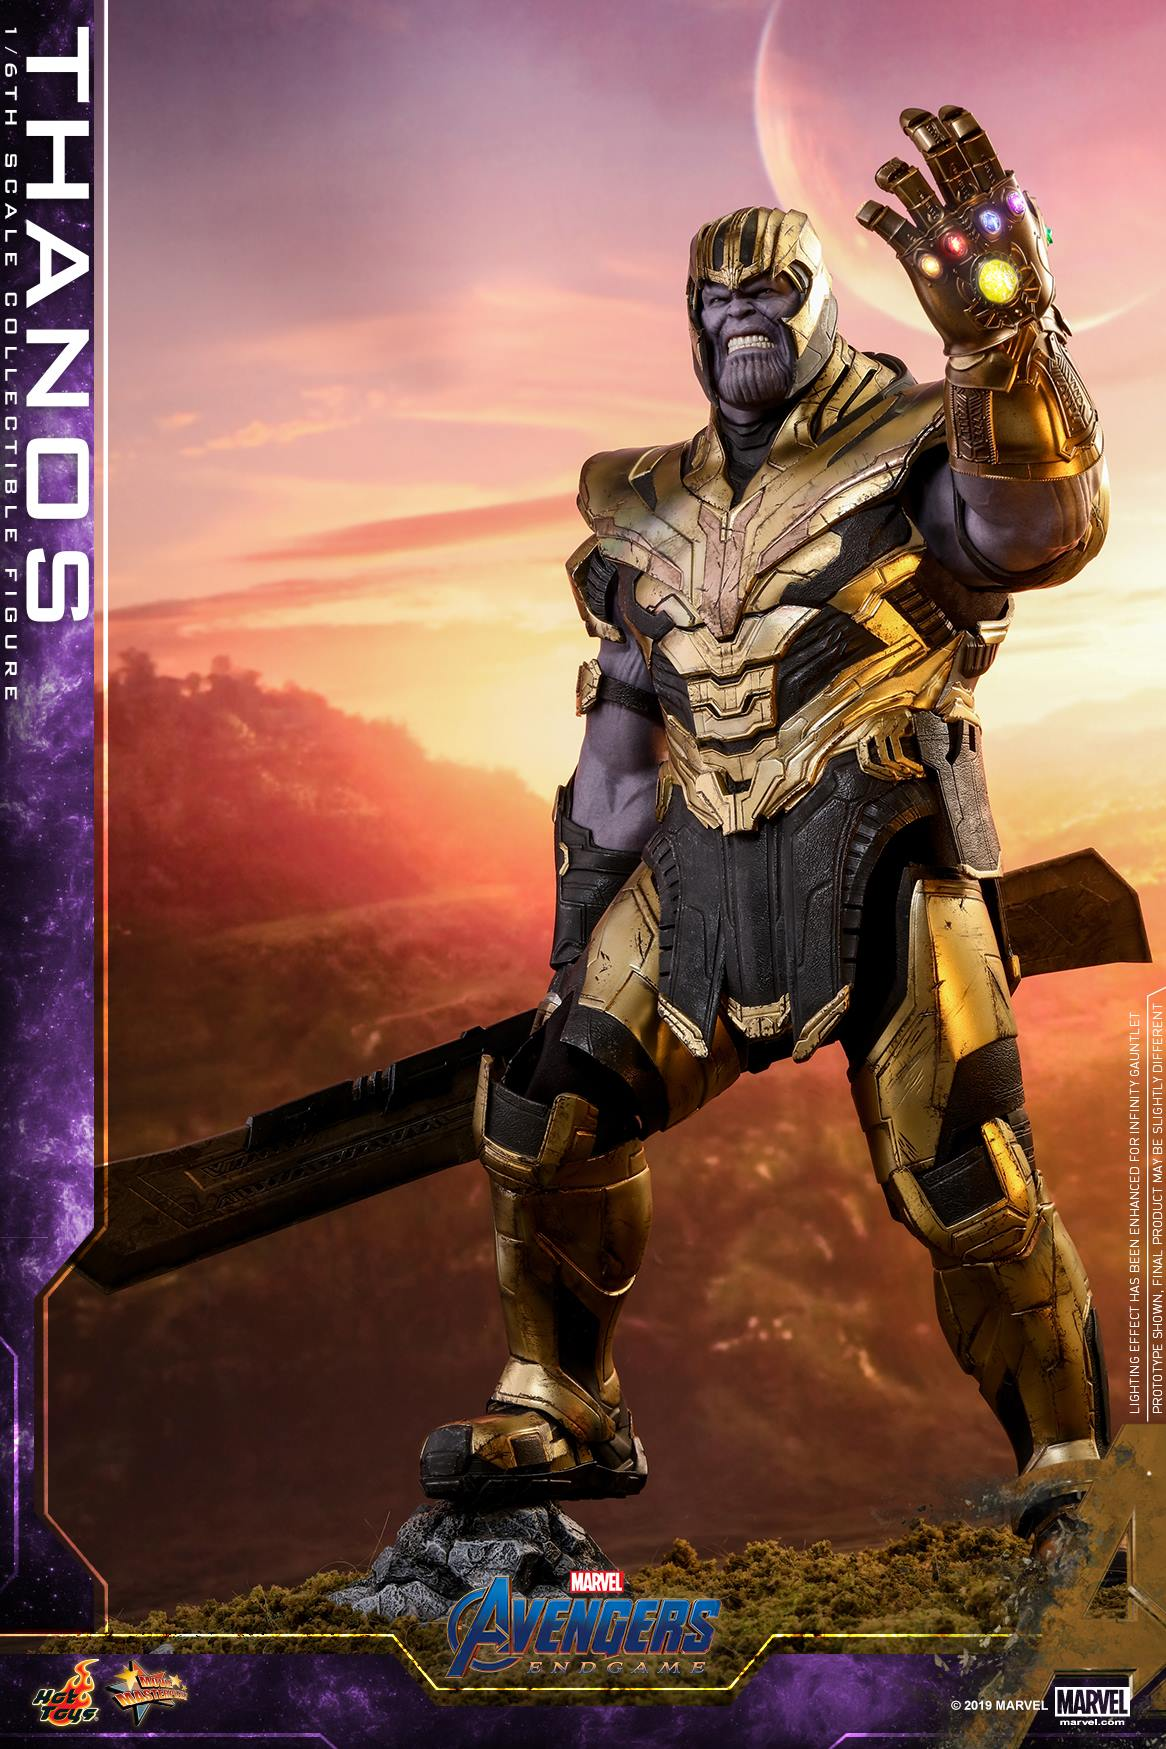 Avengers: Endgame - Iron Man Mark LXXXV and Thanos by Hot Toys - The Toyark - News